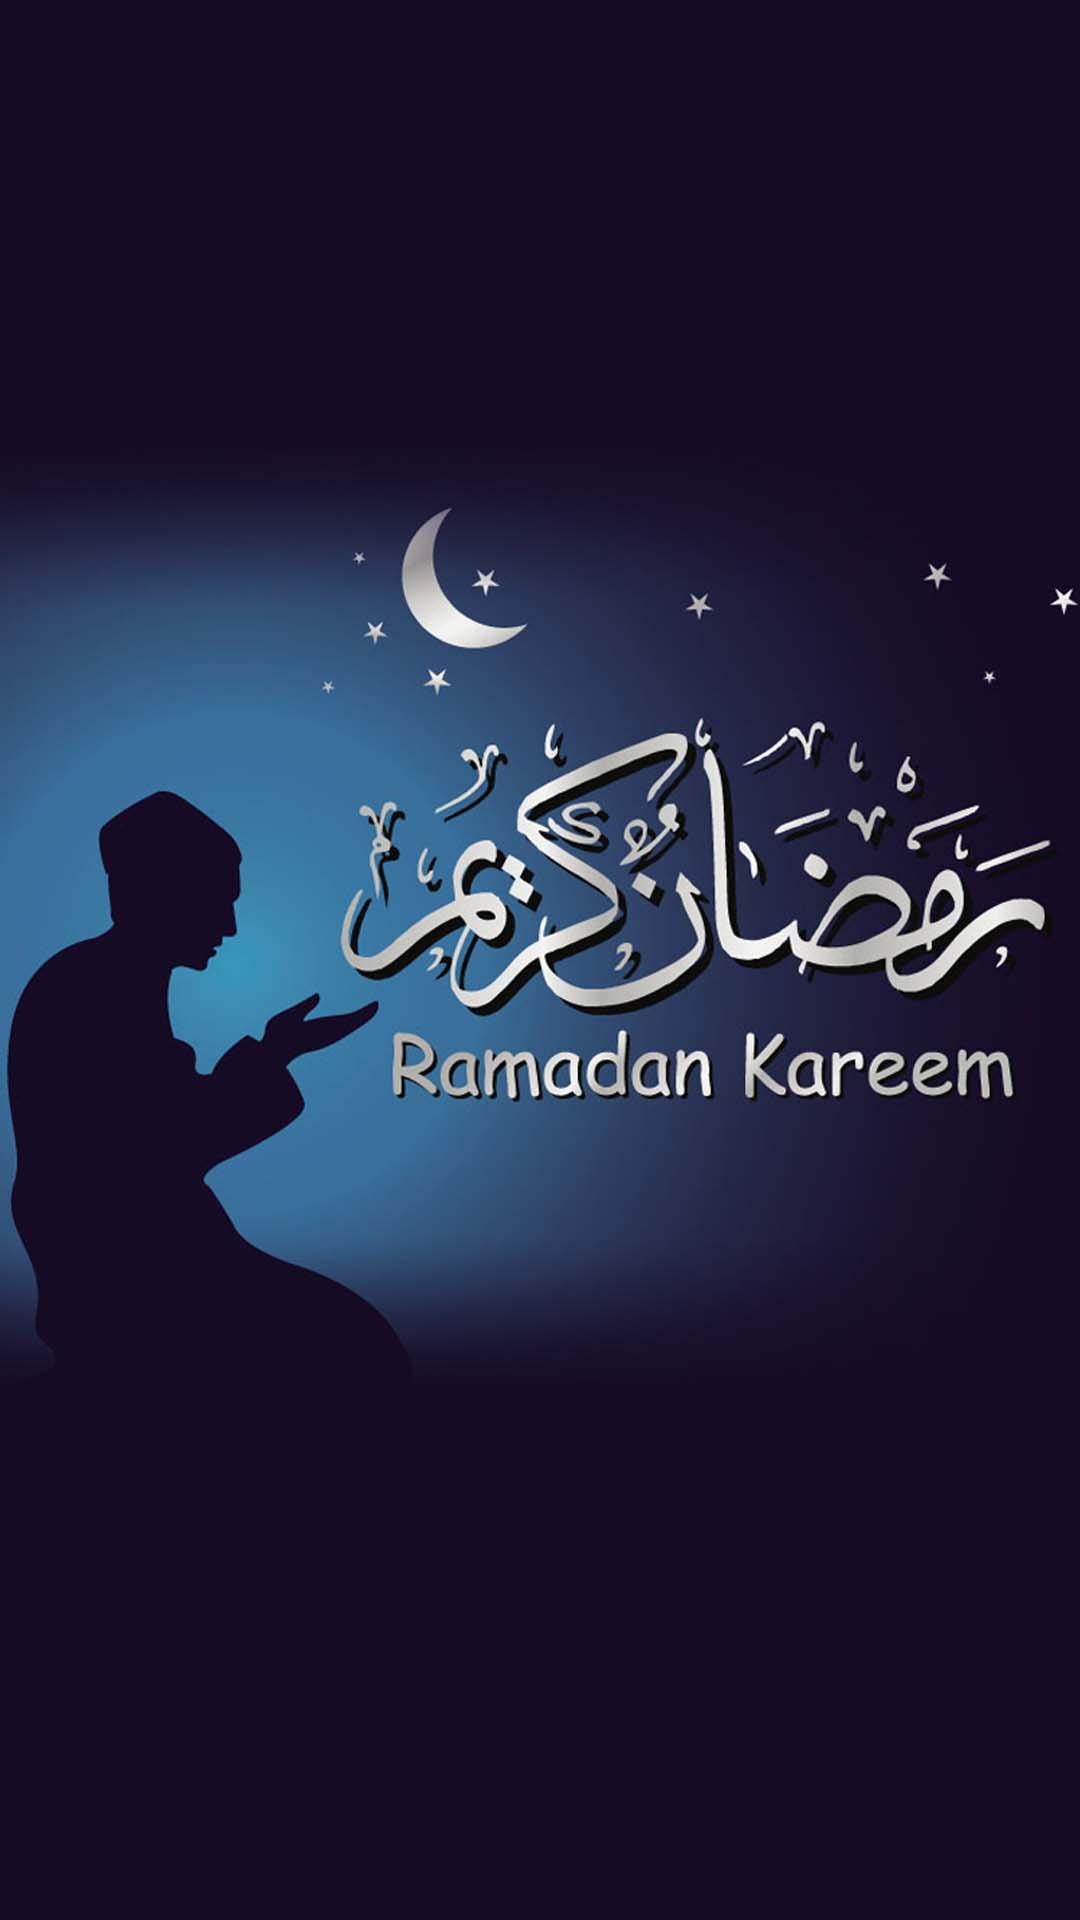 خلفيات موبايل رمضان كريم Mobile Wallpapers HD 11 خلفيات موبايل رمضان كريم Mobile Wallpapers HD